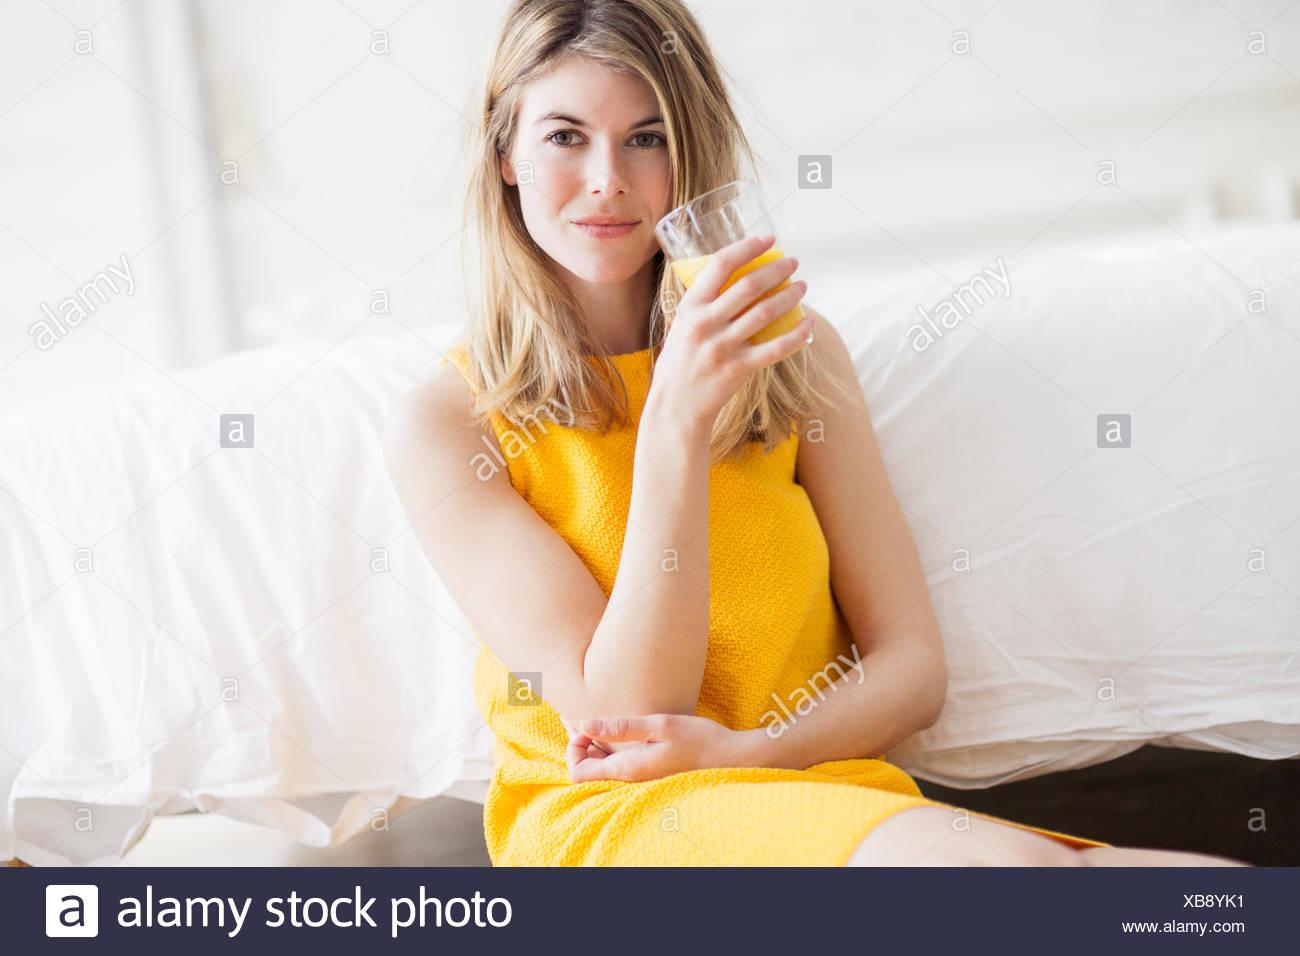 Mujer beber jugo de naranja Imagen De Stock